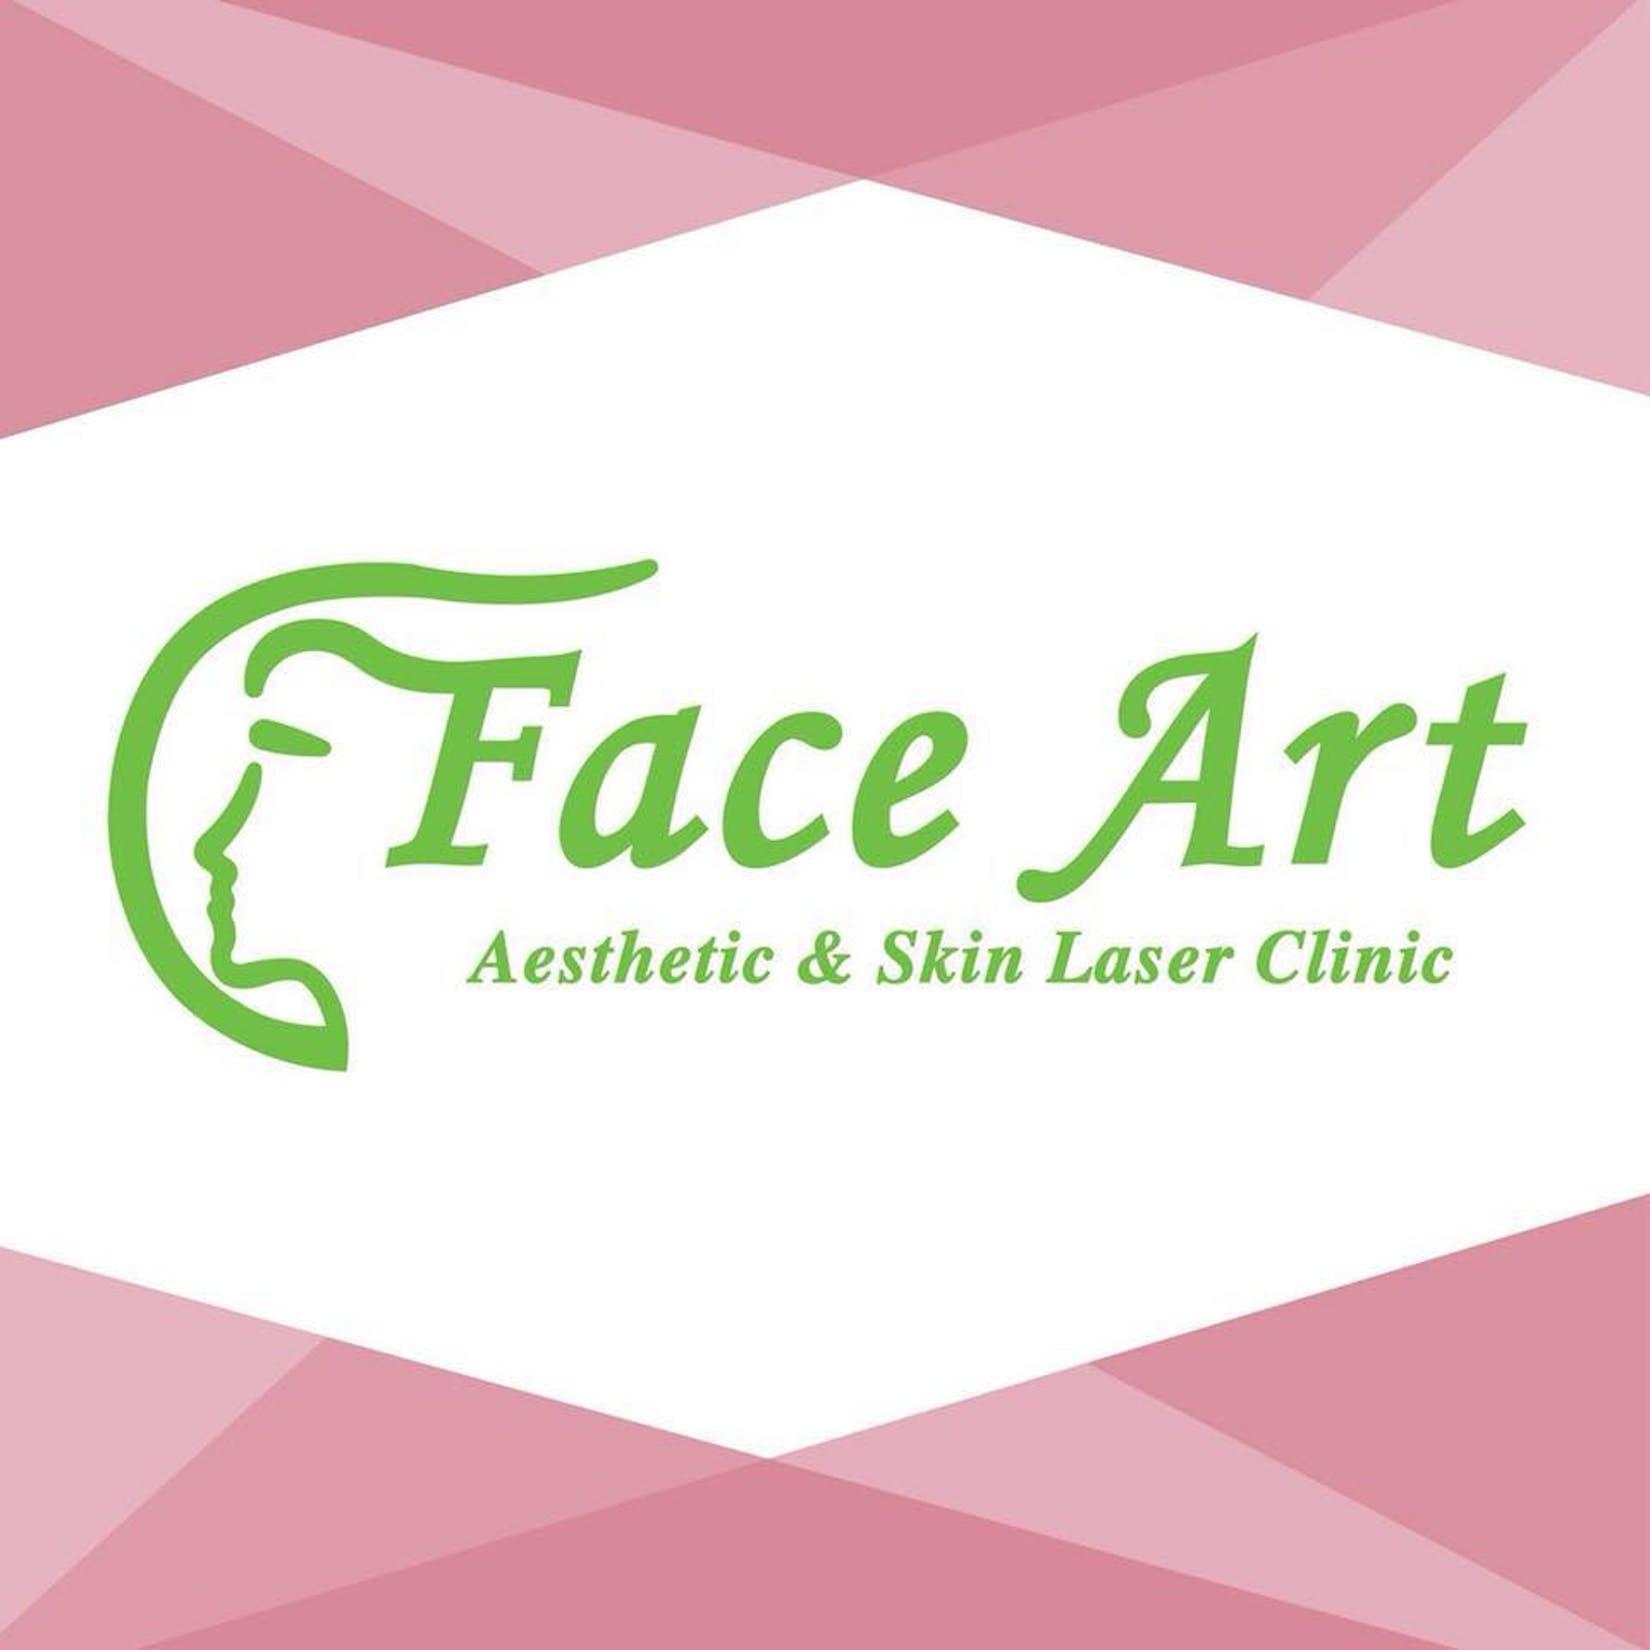 Face Art Aesthetic & Skin Laser Clinic | Beauty